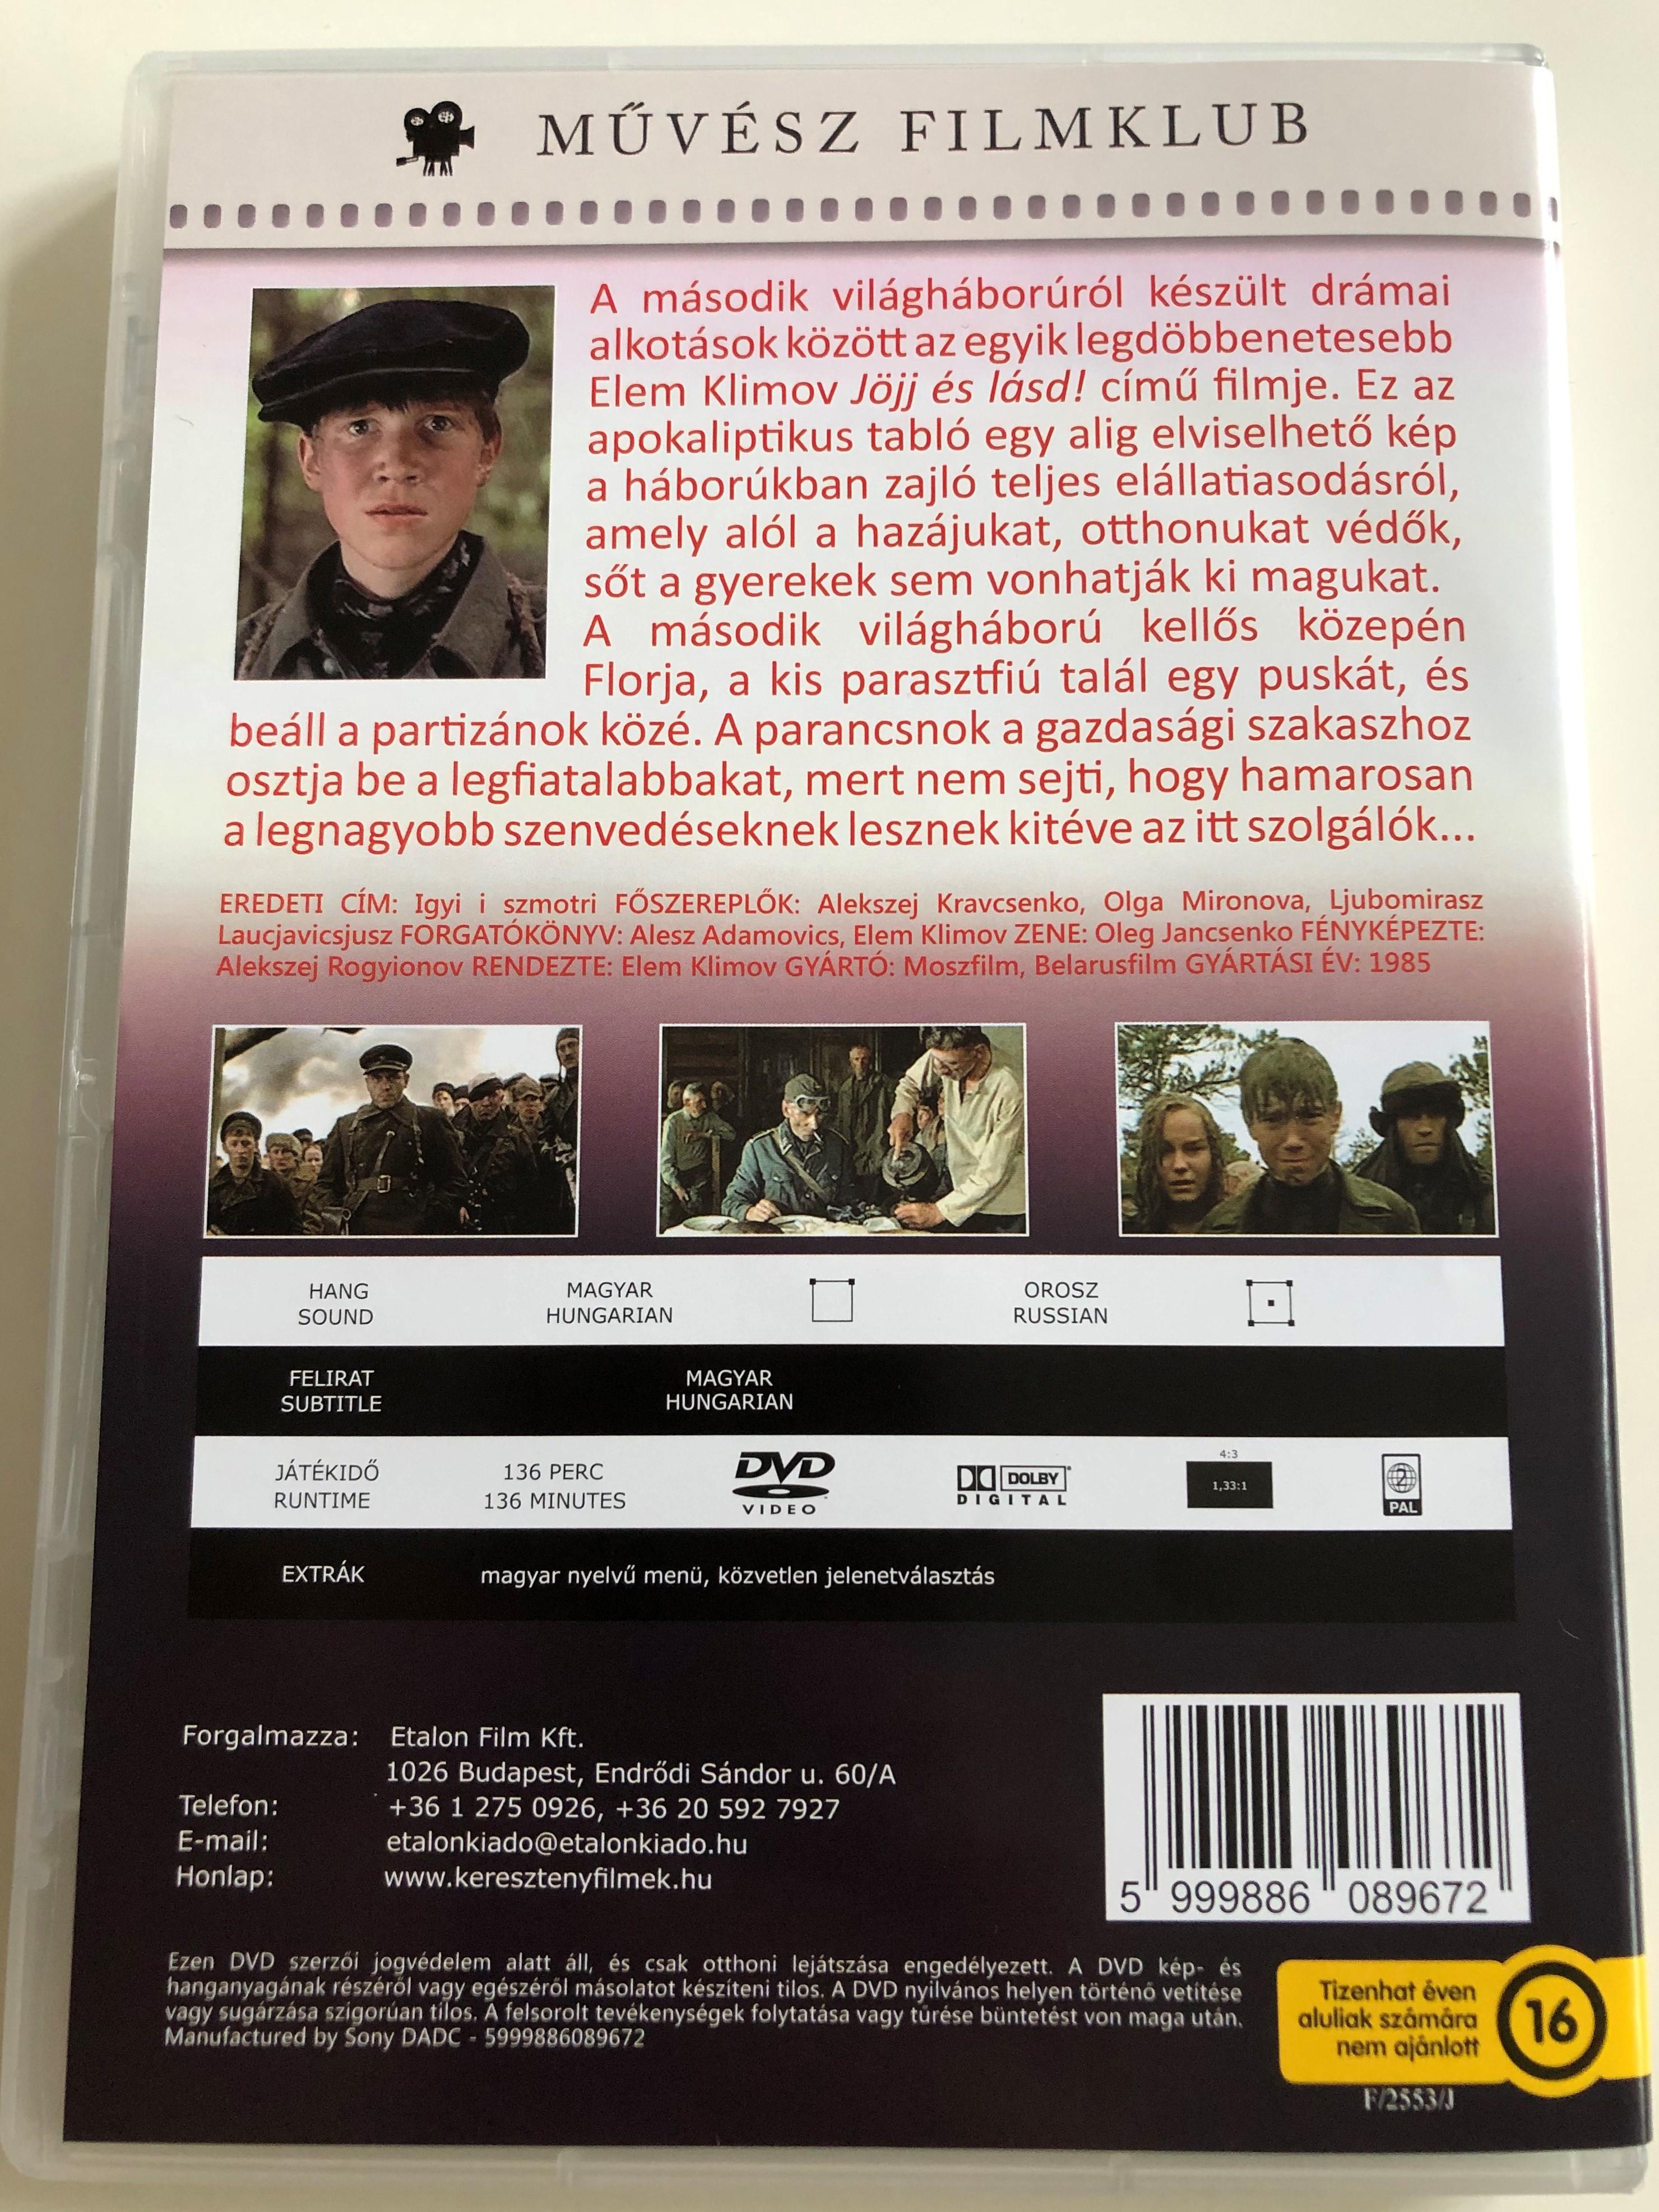 -dvd-1985-j-jj-s-l-sd-come-and-see-directed-by-elem-klimov-starring-aleksei-kravchenko-olga-mironova-2-.jpg